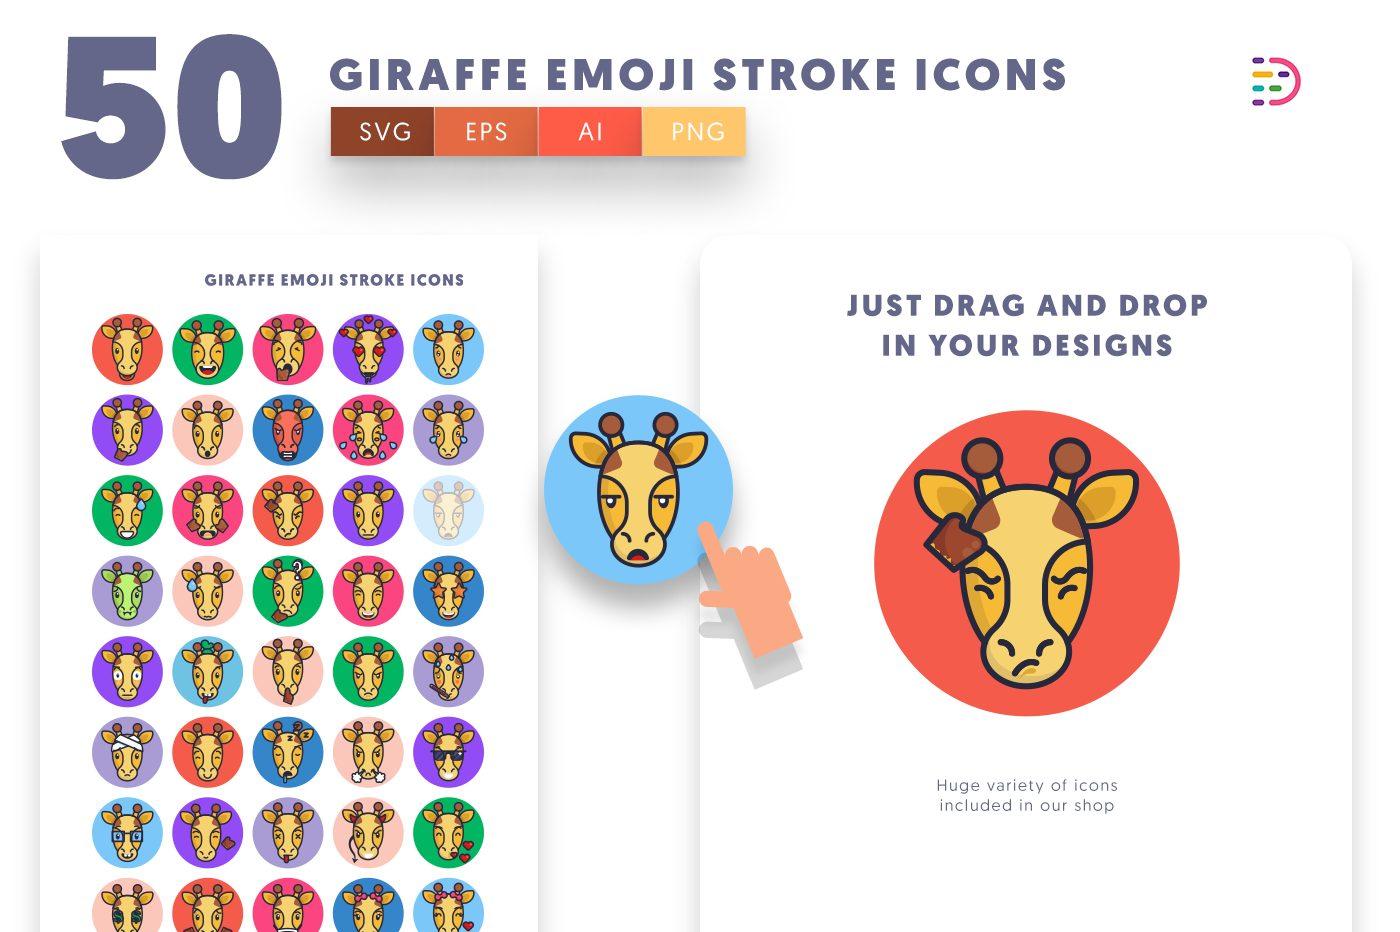 Drag and drop vector 50 Giraffe Emoji Stroke Icons